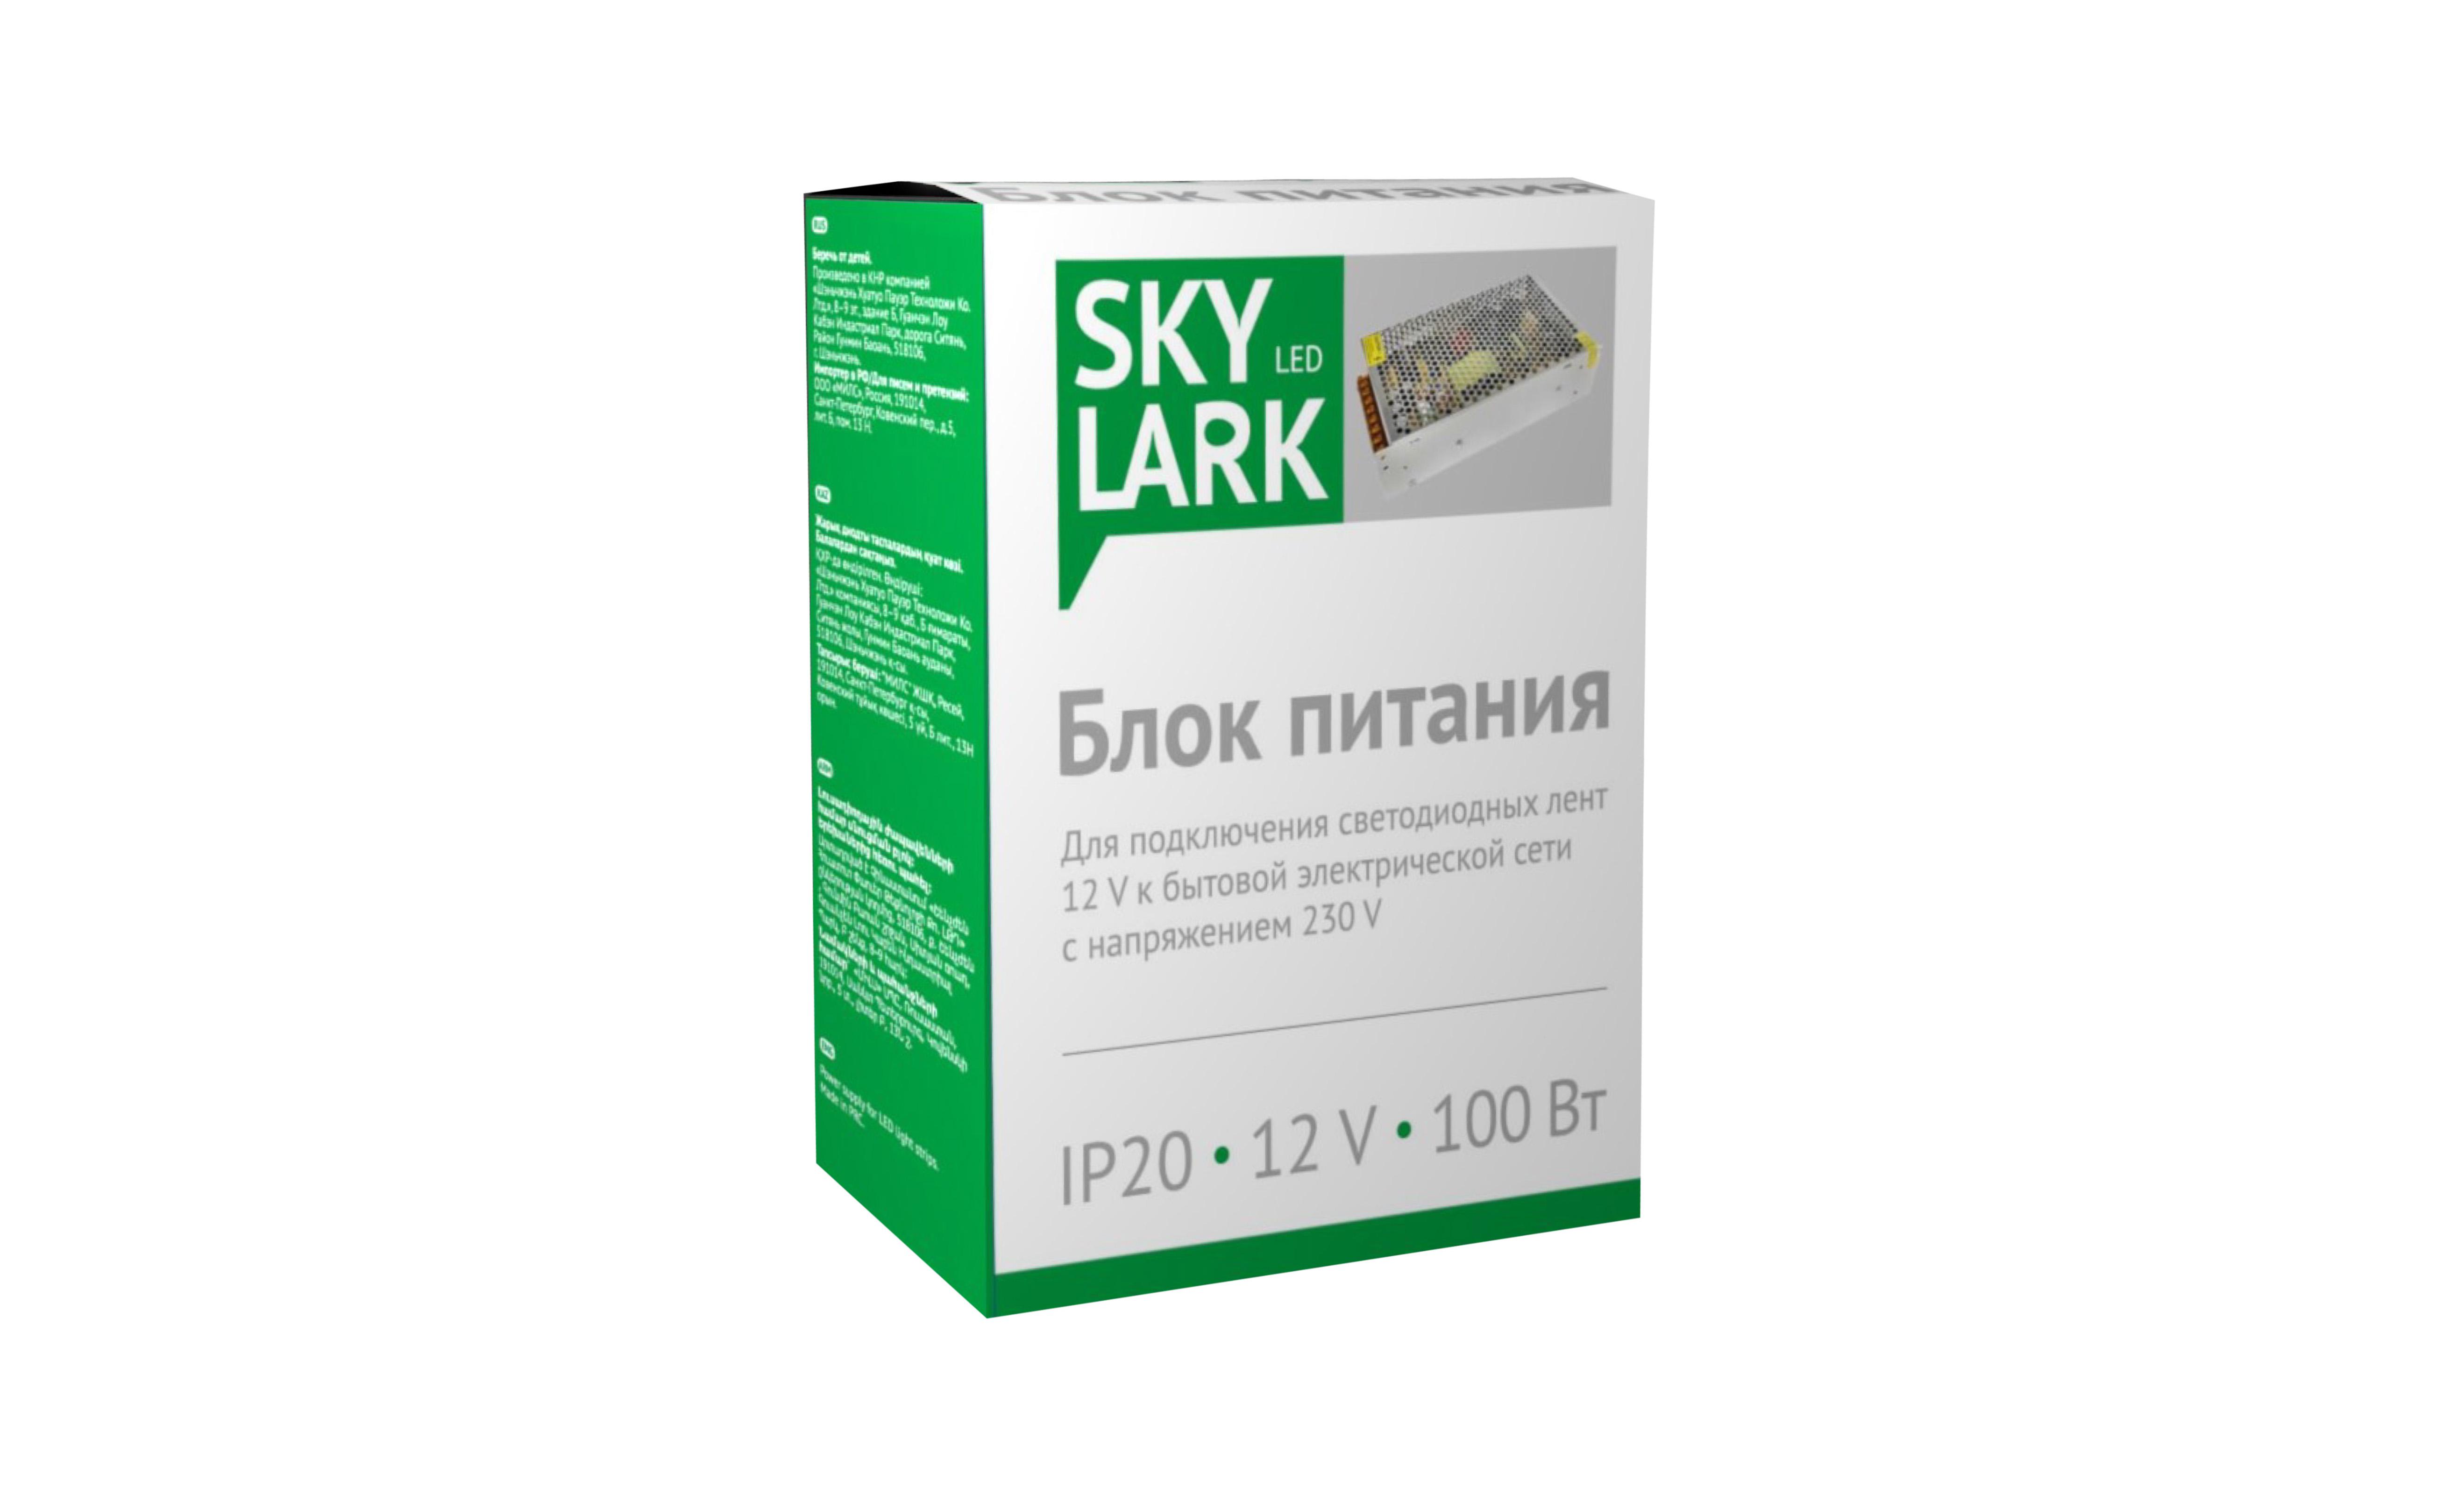 Блок питания Skylark S026